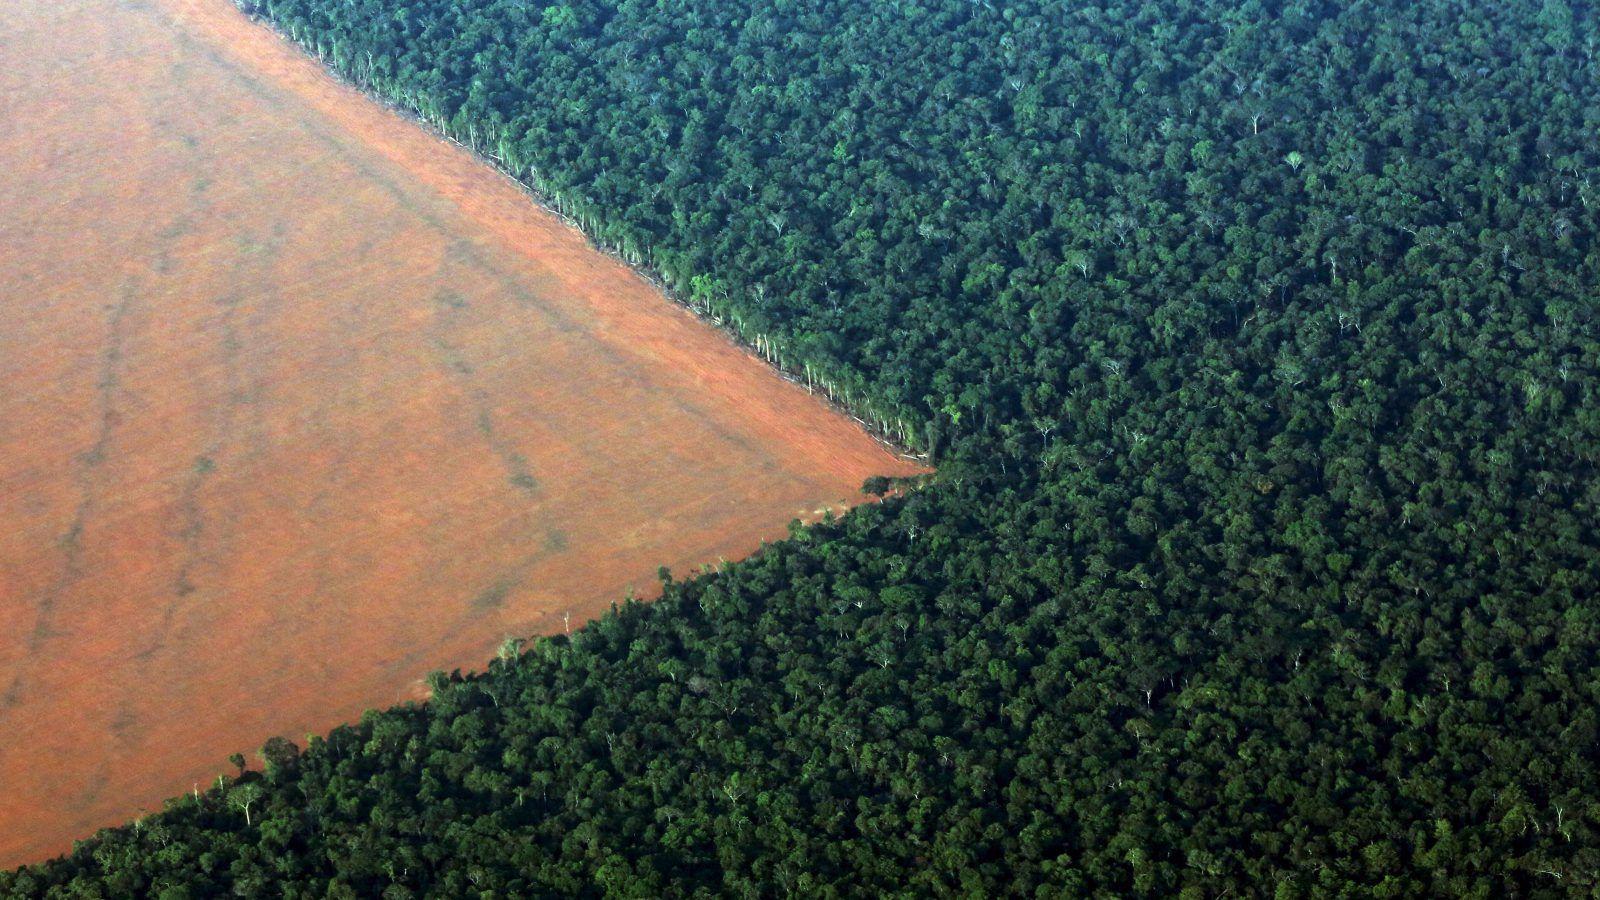 The Amazon is under threat